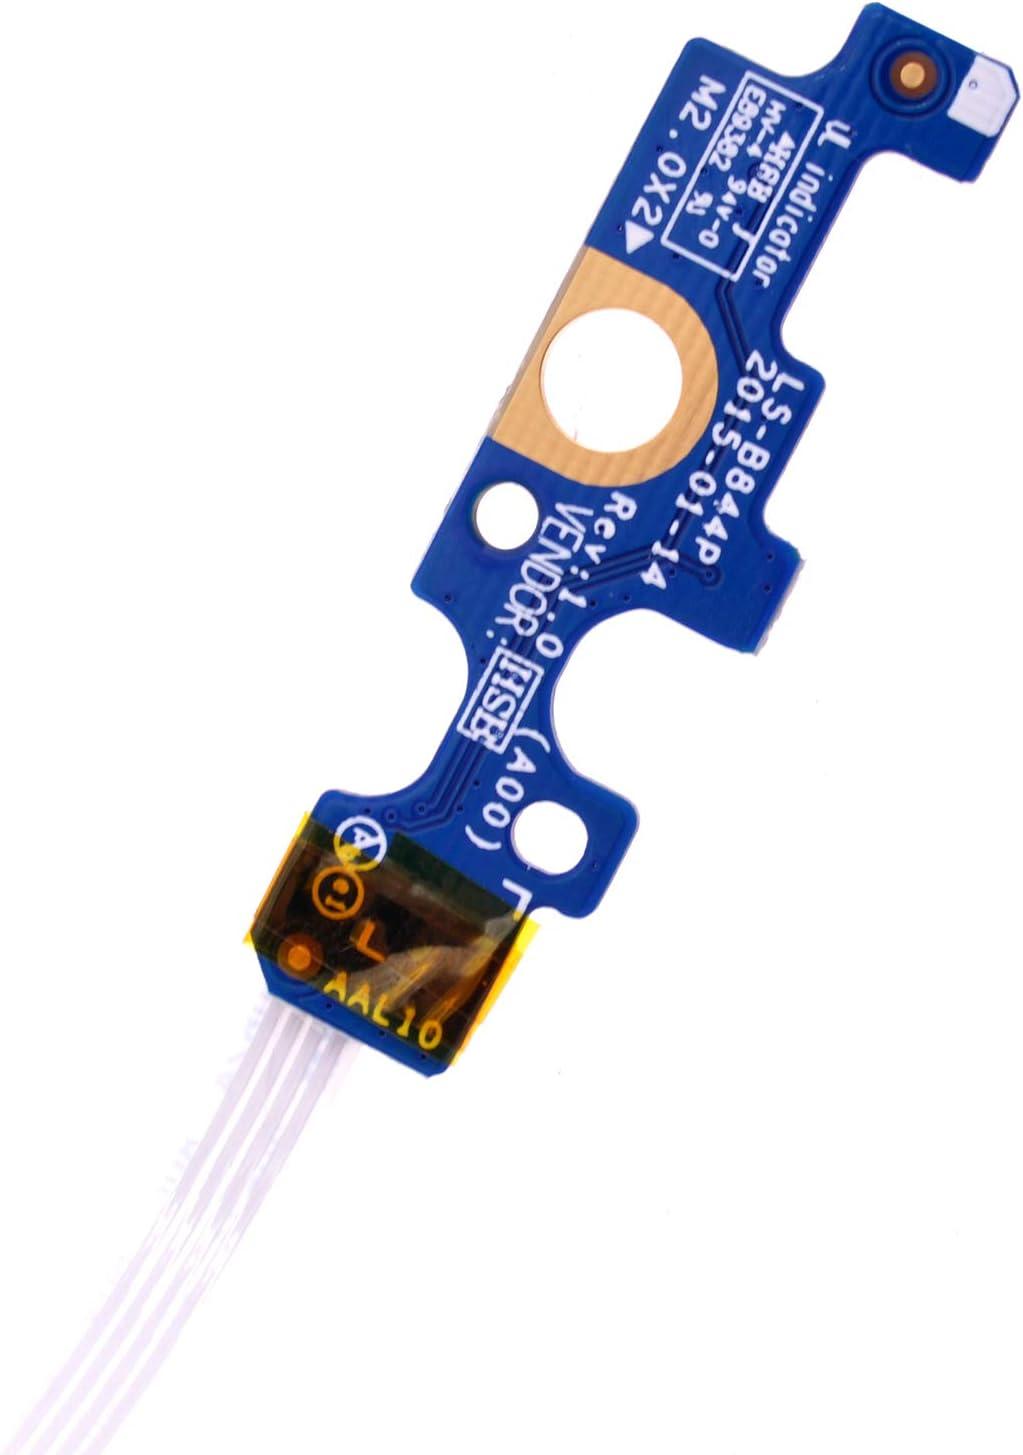 boton power  LS-B844P Dell Inspiron 15 5551 5552 5458 Vostro